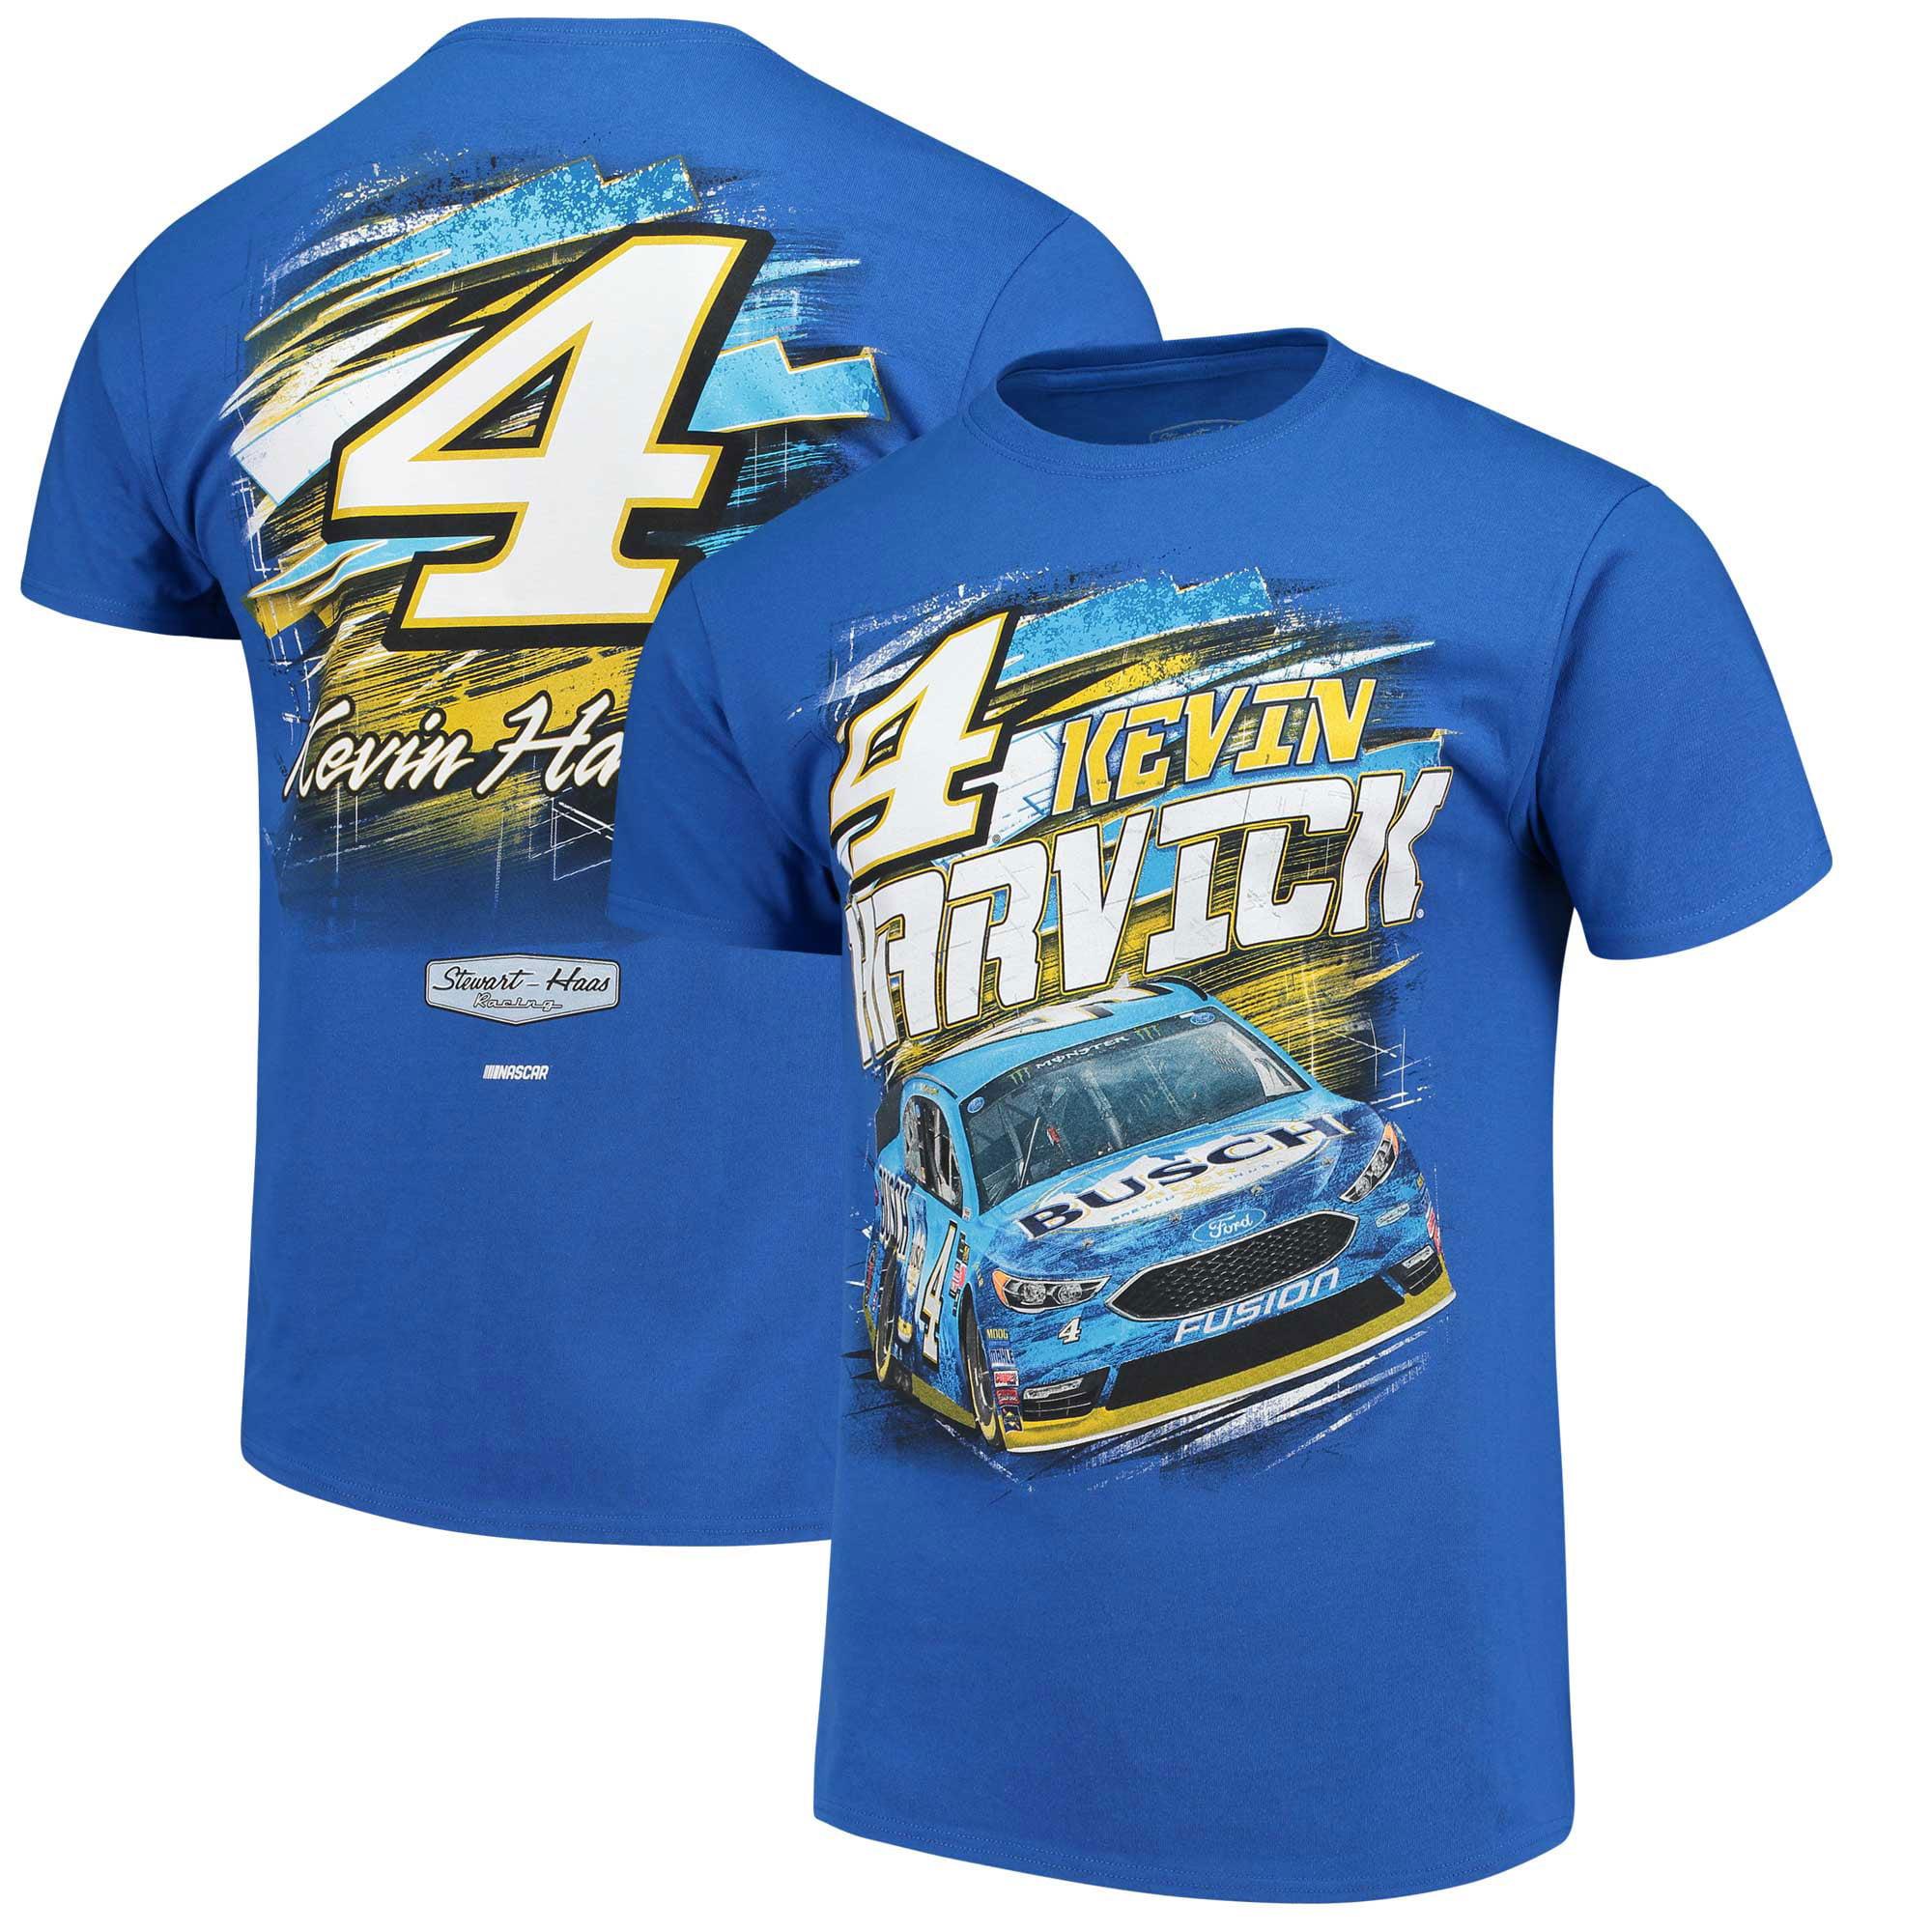 Kevin Harvick Busch Torque T-Shirt - Royal